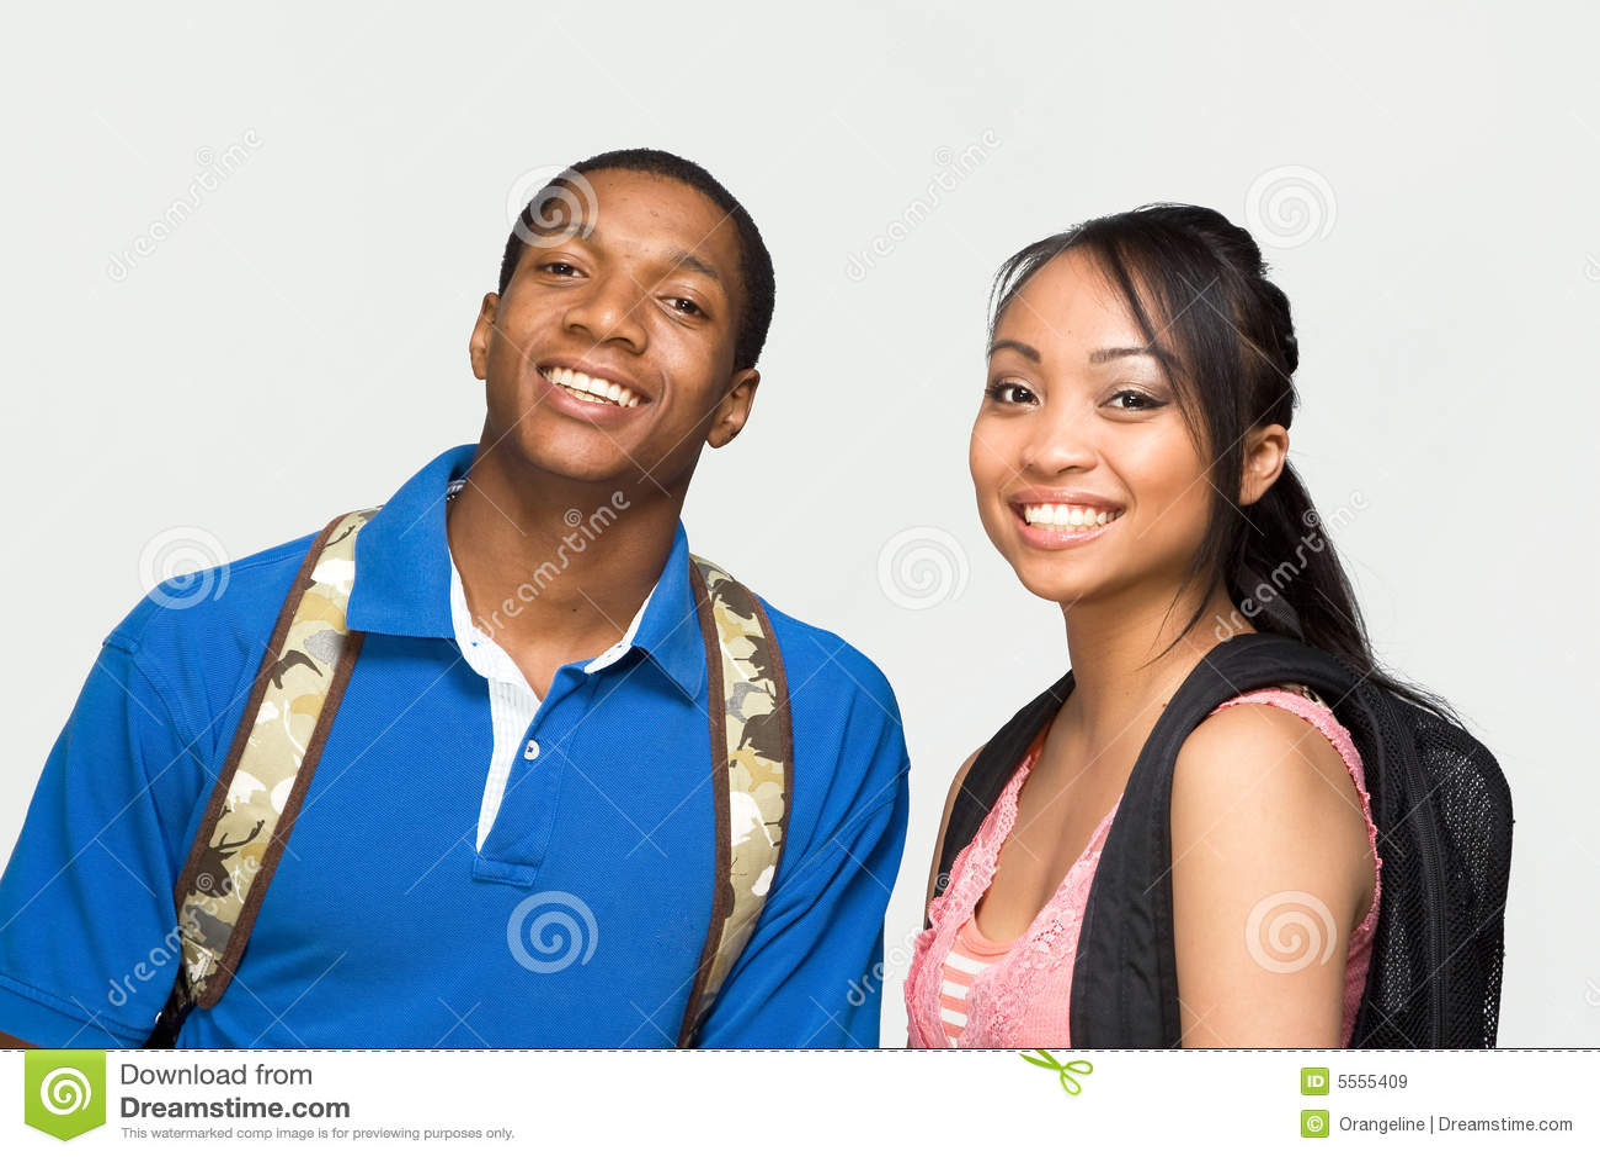 Students Wearing Backpacks - Horizontal